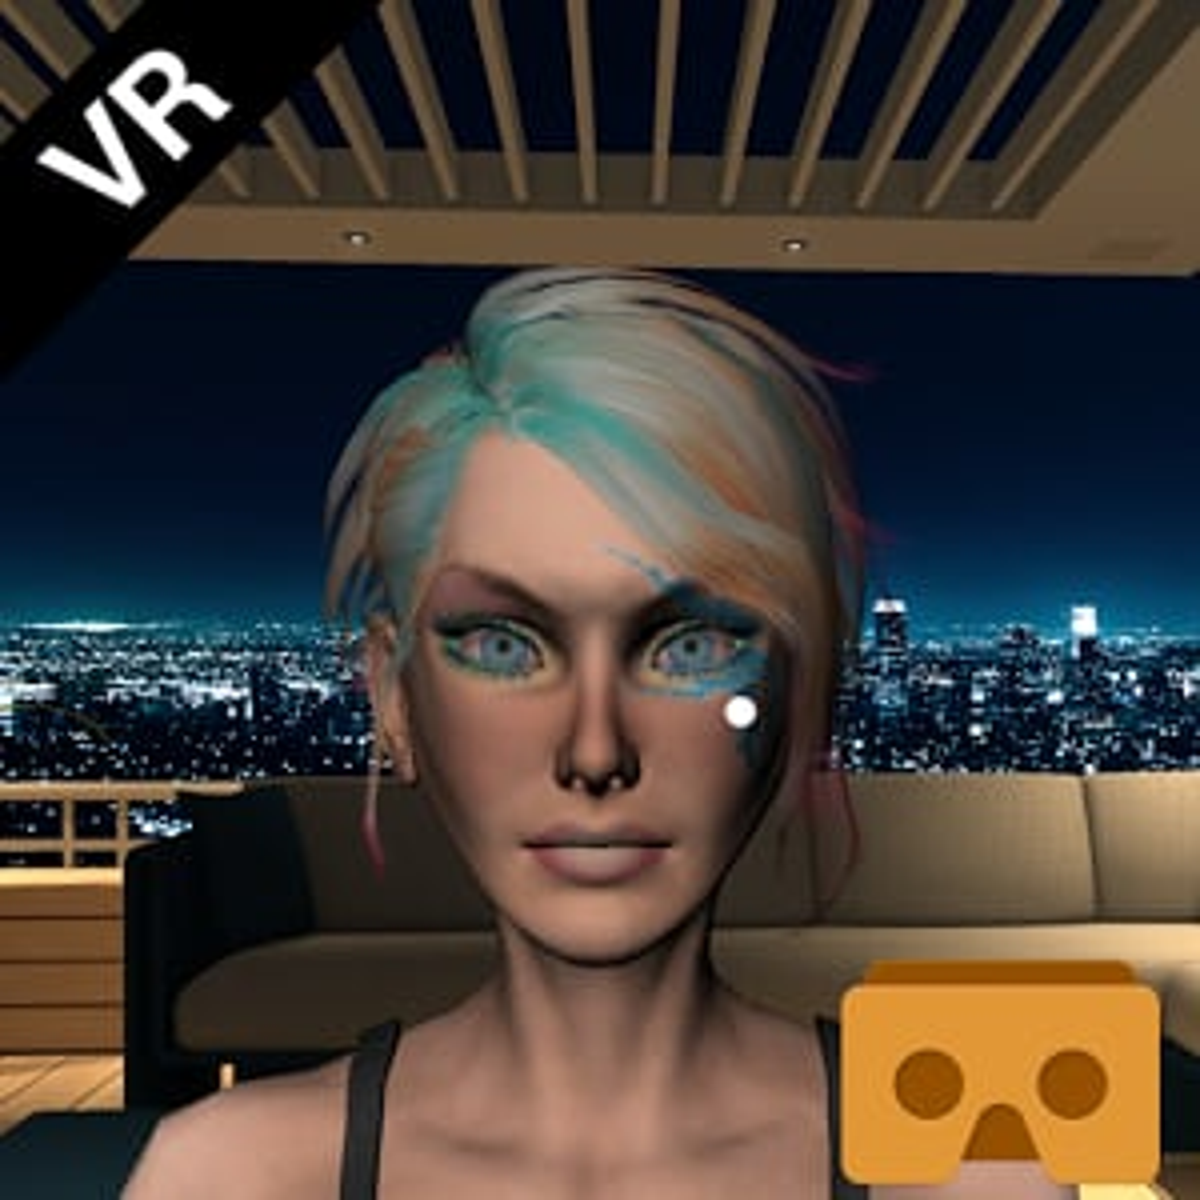 VR Girlfriend for Cardboard 1.1